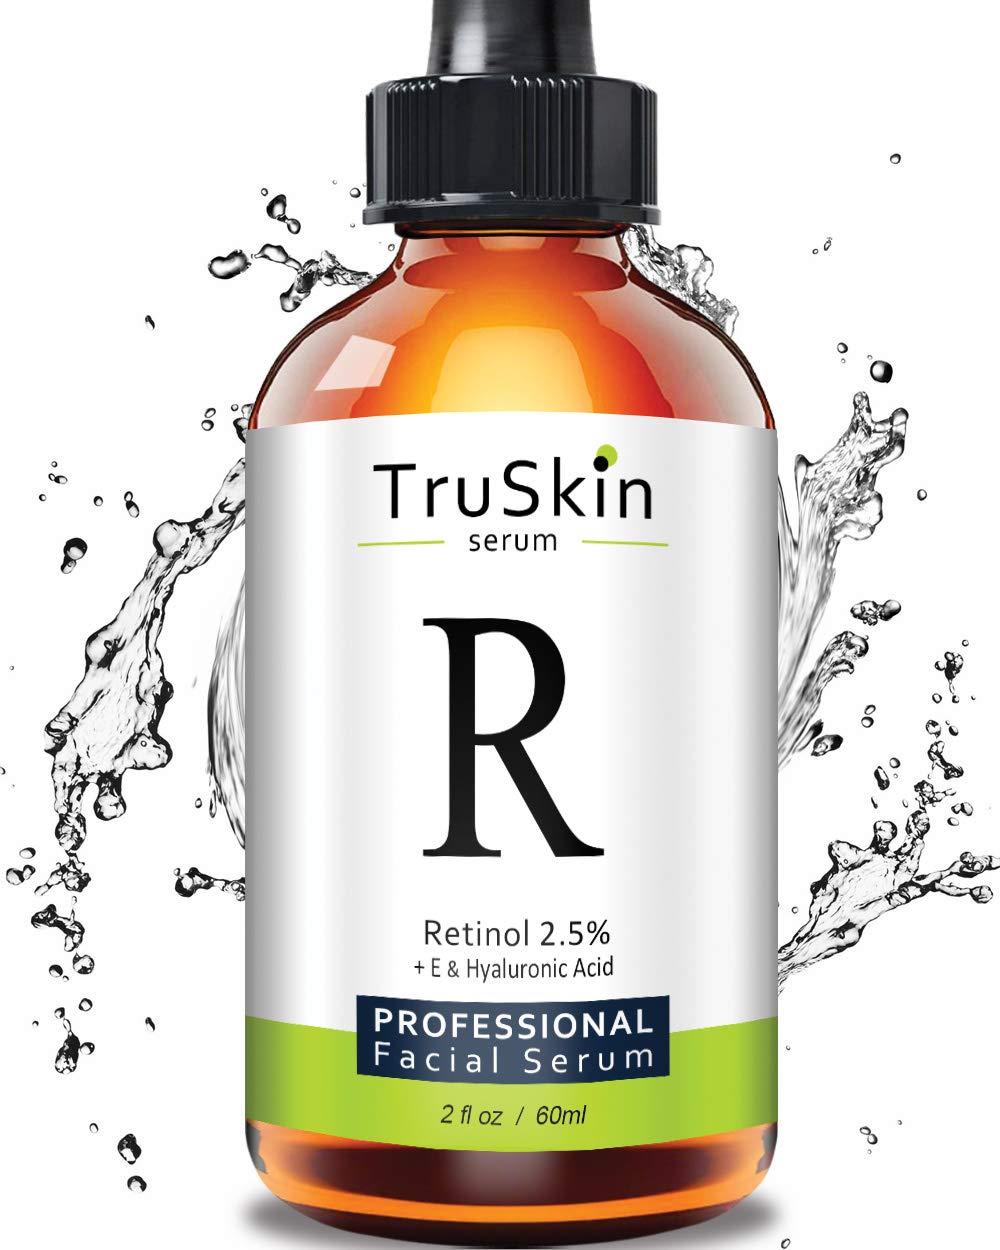 TruSkin RETINOL Serum for Wrinkles, Fine Lines - [BIG 2-OZ Bottle] - Vitamin A, E, Hyaluronic Acid, Organic Green Tea, Jojoba Oil, BEST Anti Wrinkle Facial Serum. 2oz